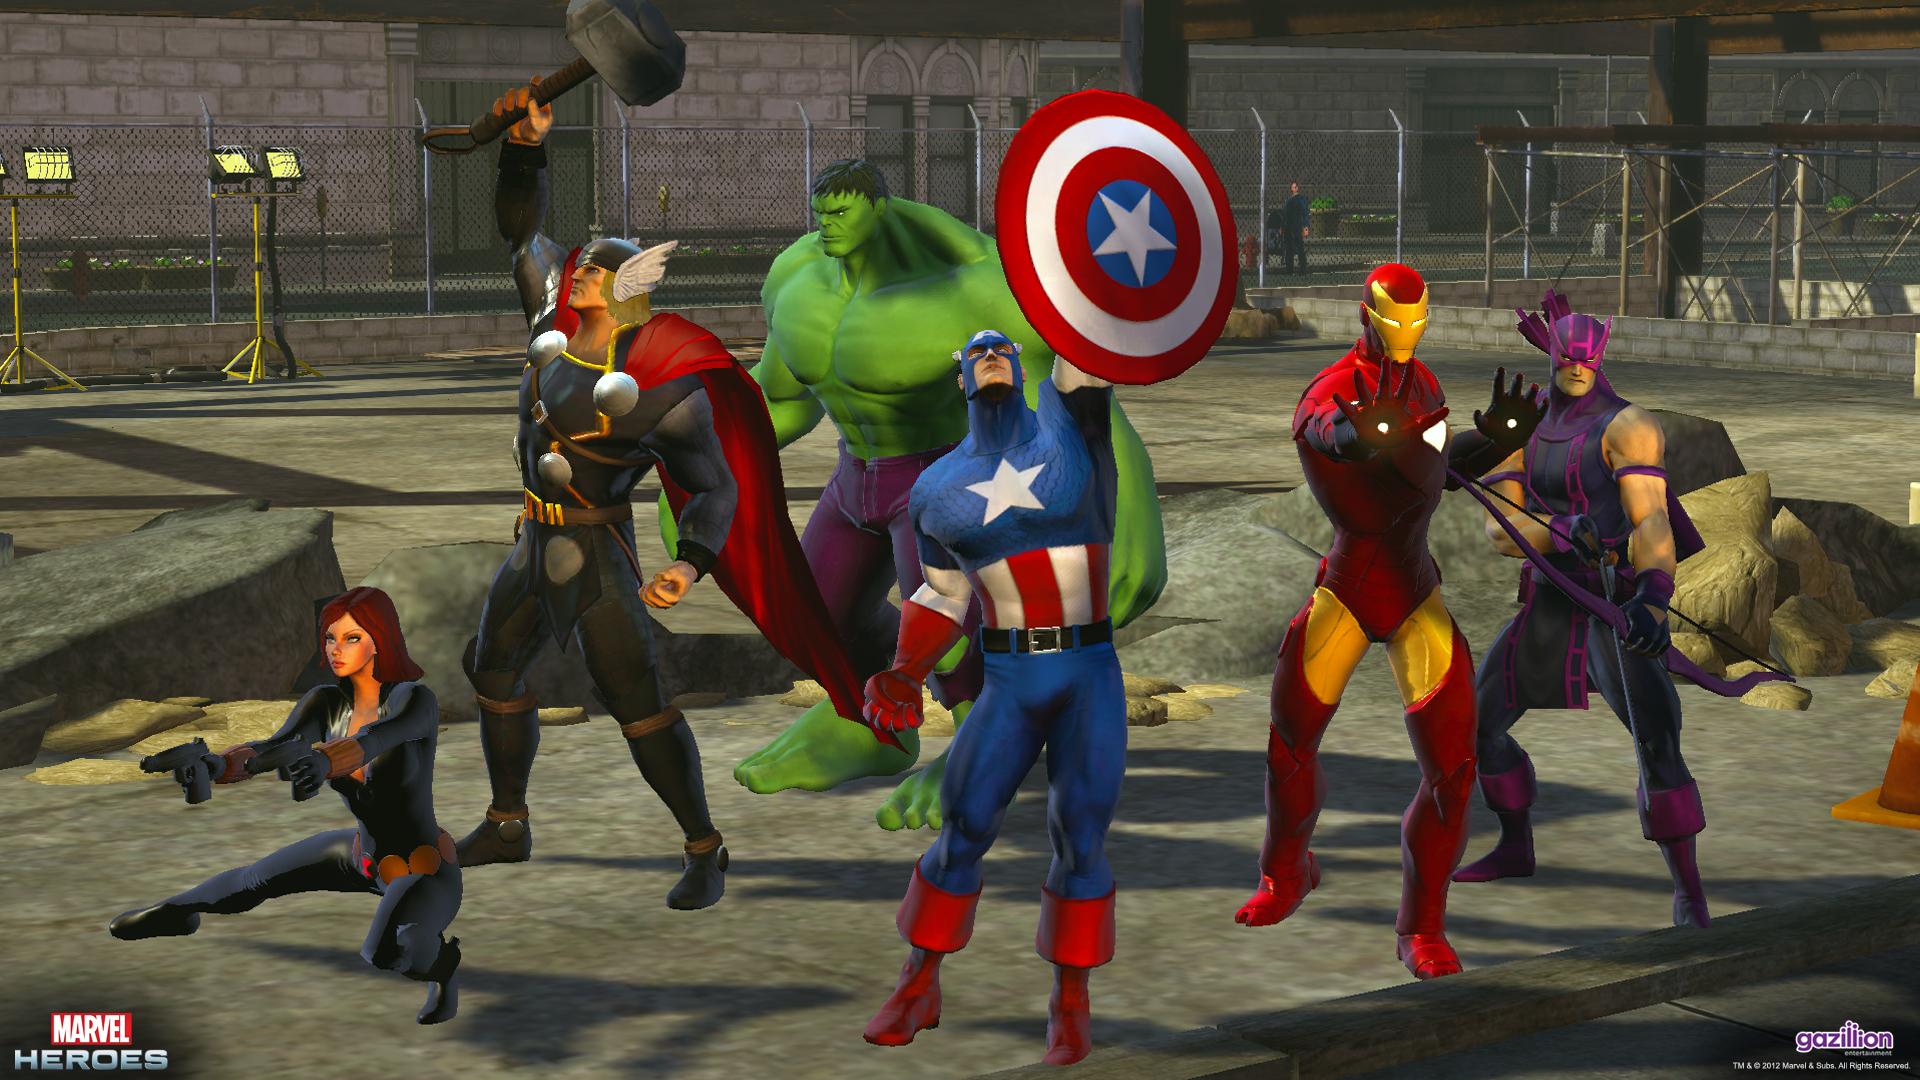 avengers_NYC_CU_hawkeye_black_widow_iron_man_thor_hulk_captain_america(1)